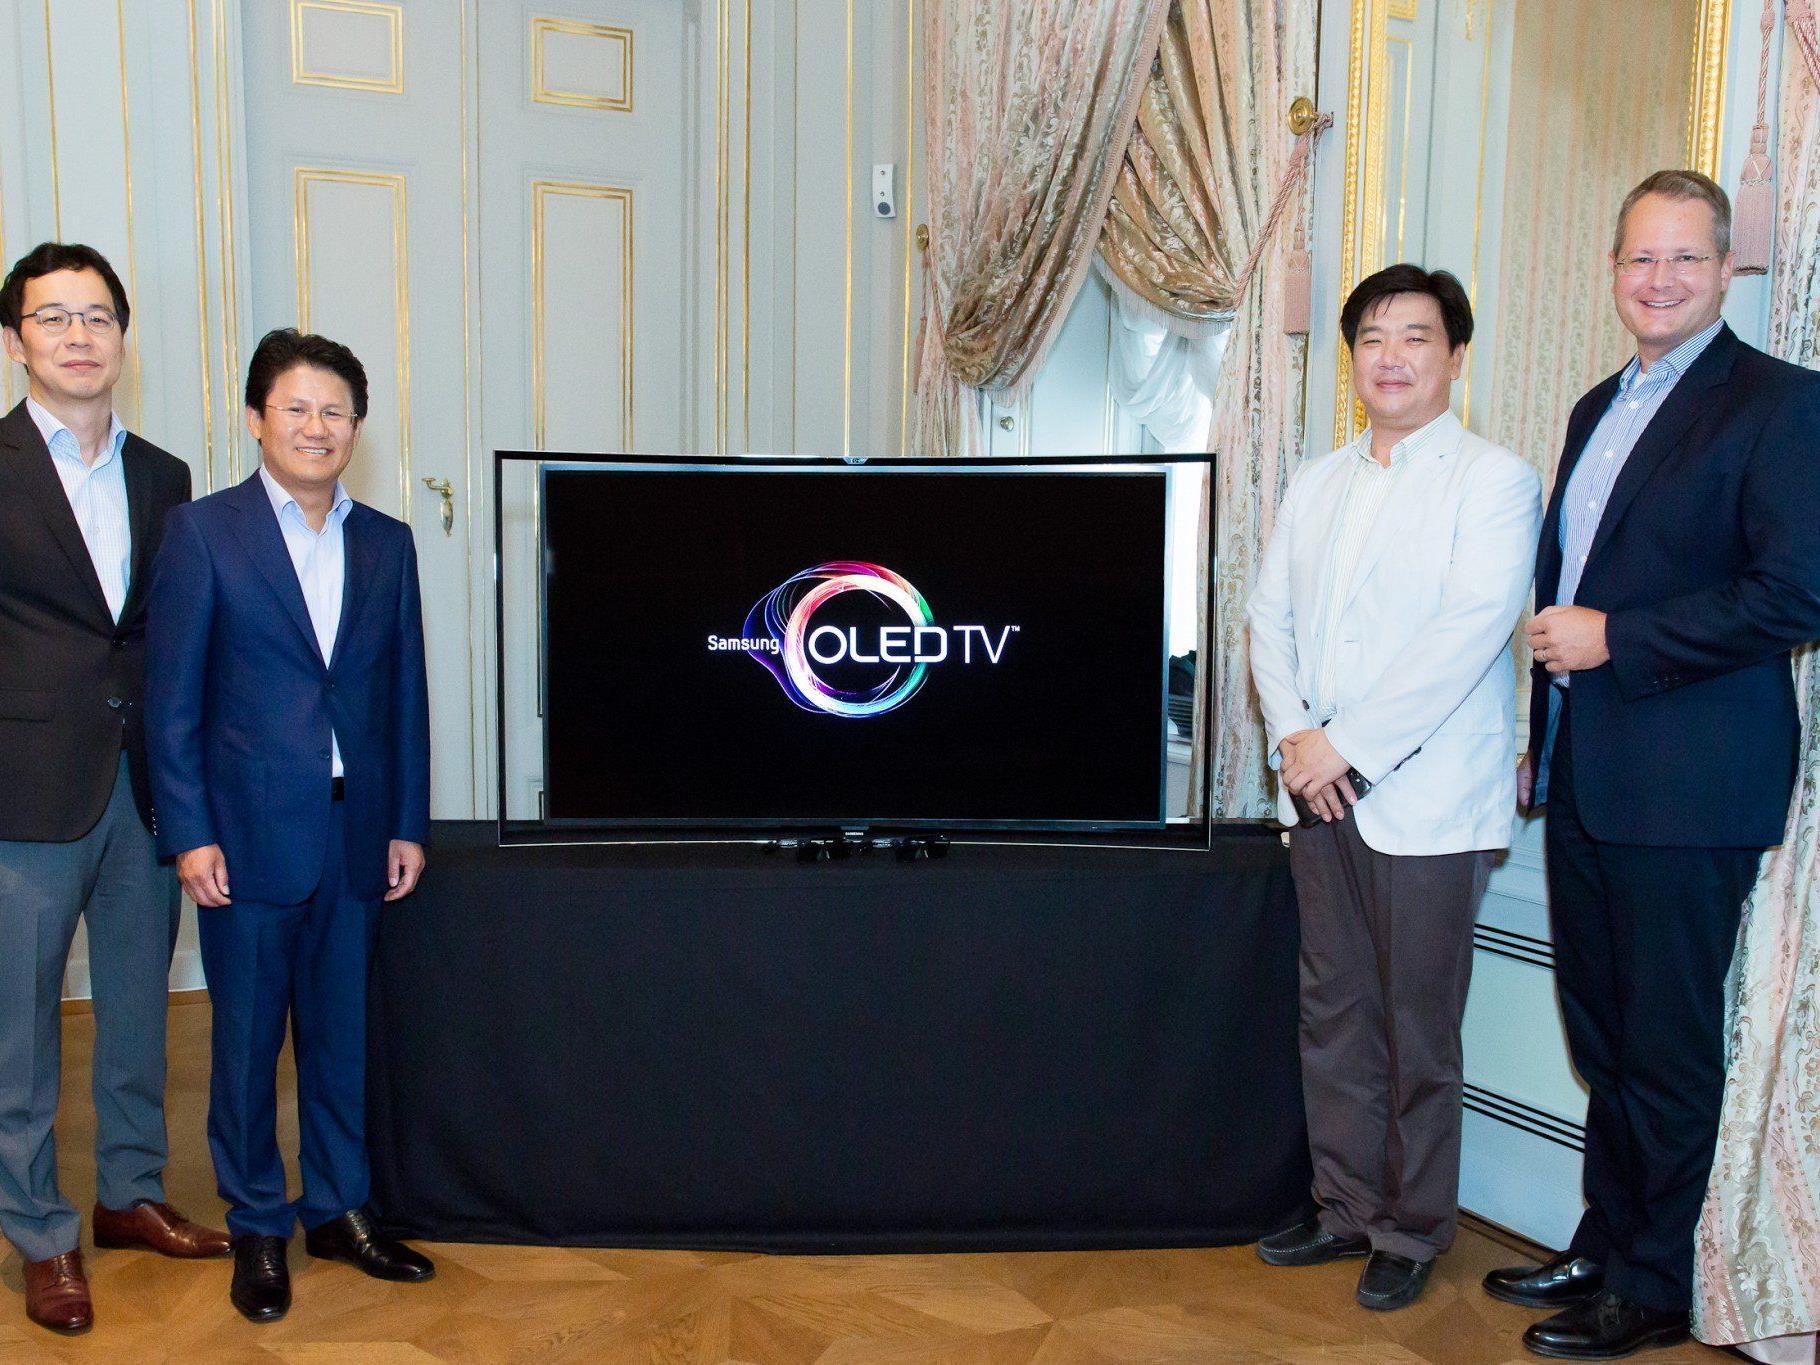 Moderne Technik im klassischen Ambiente: Die Präsentation des Curved OLED TV KE55S9C in der Wiener Albertina.